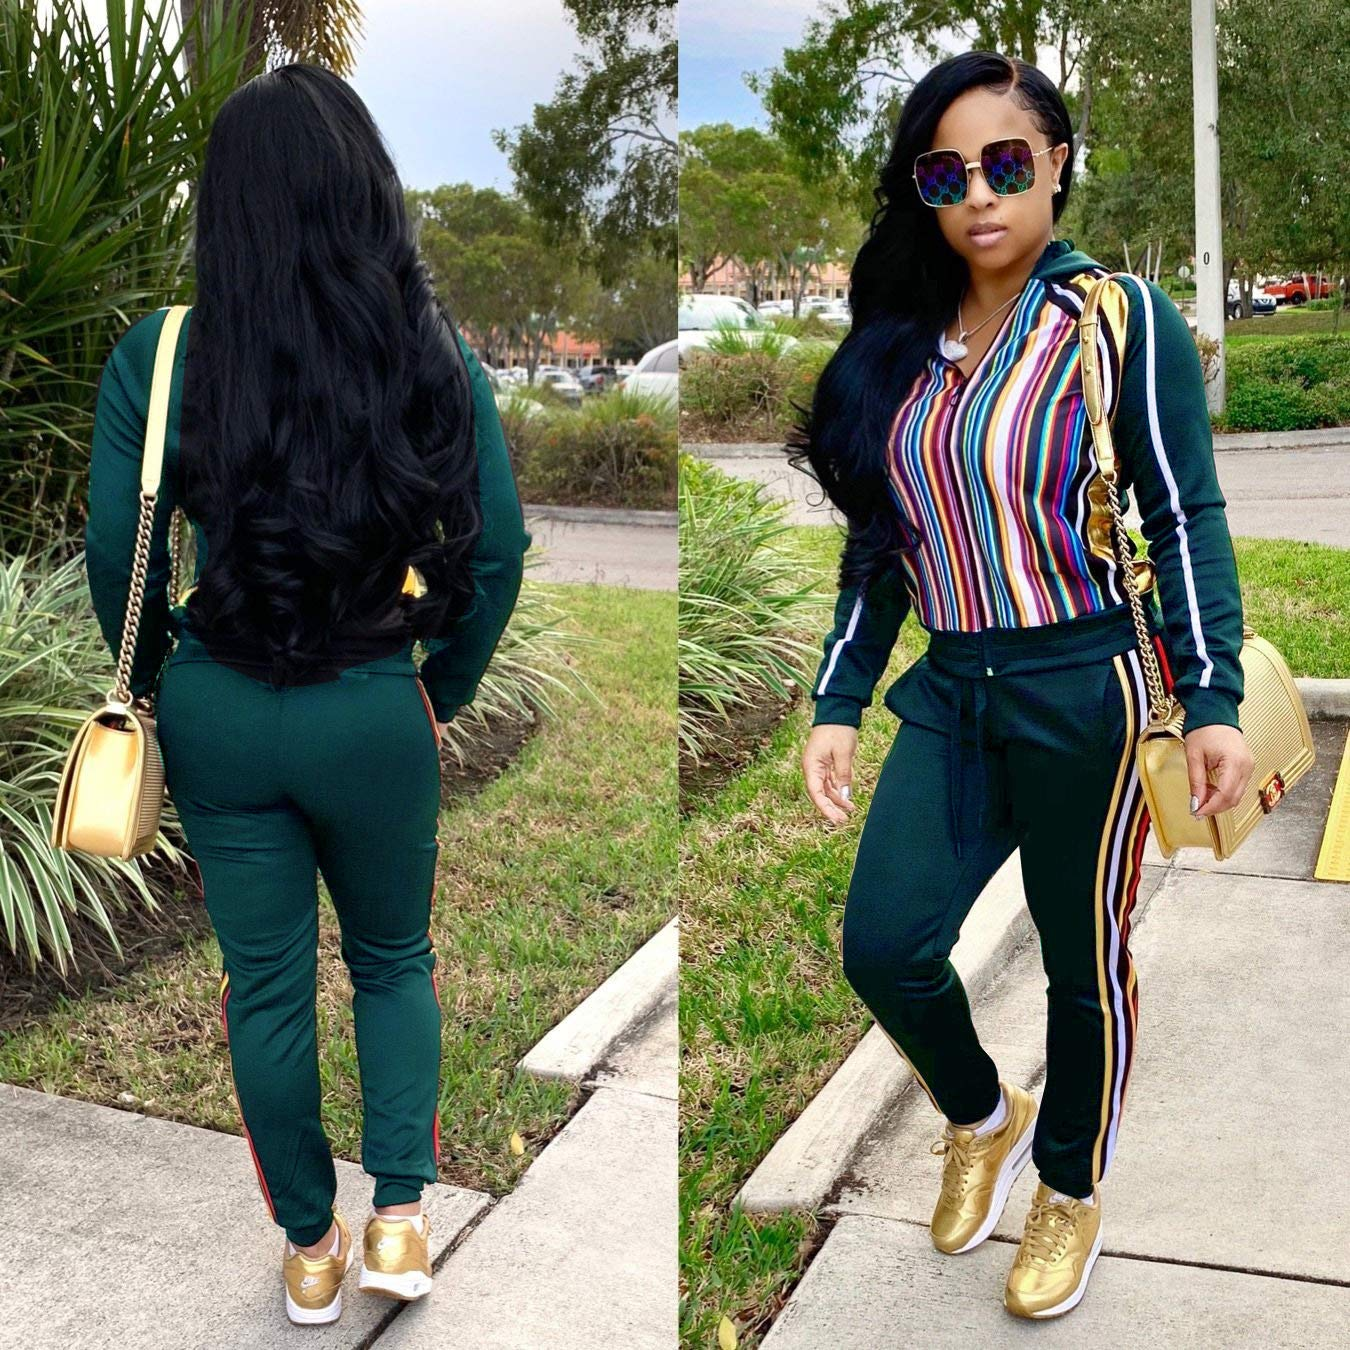 Women\'s Rainbow Stripe Sweatsuits - Fashion Front Zip up Hoodied Jogging Suits Medium Green